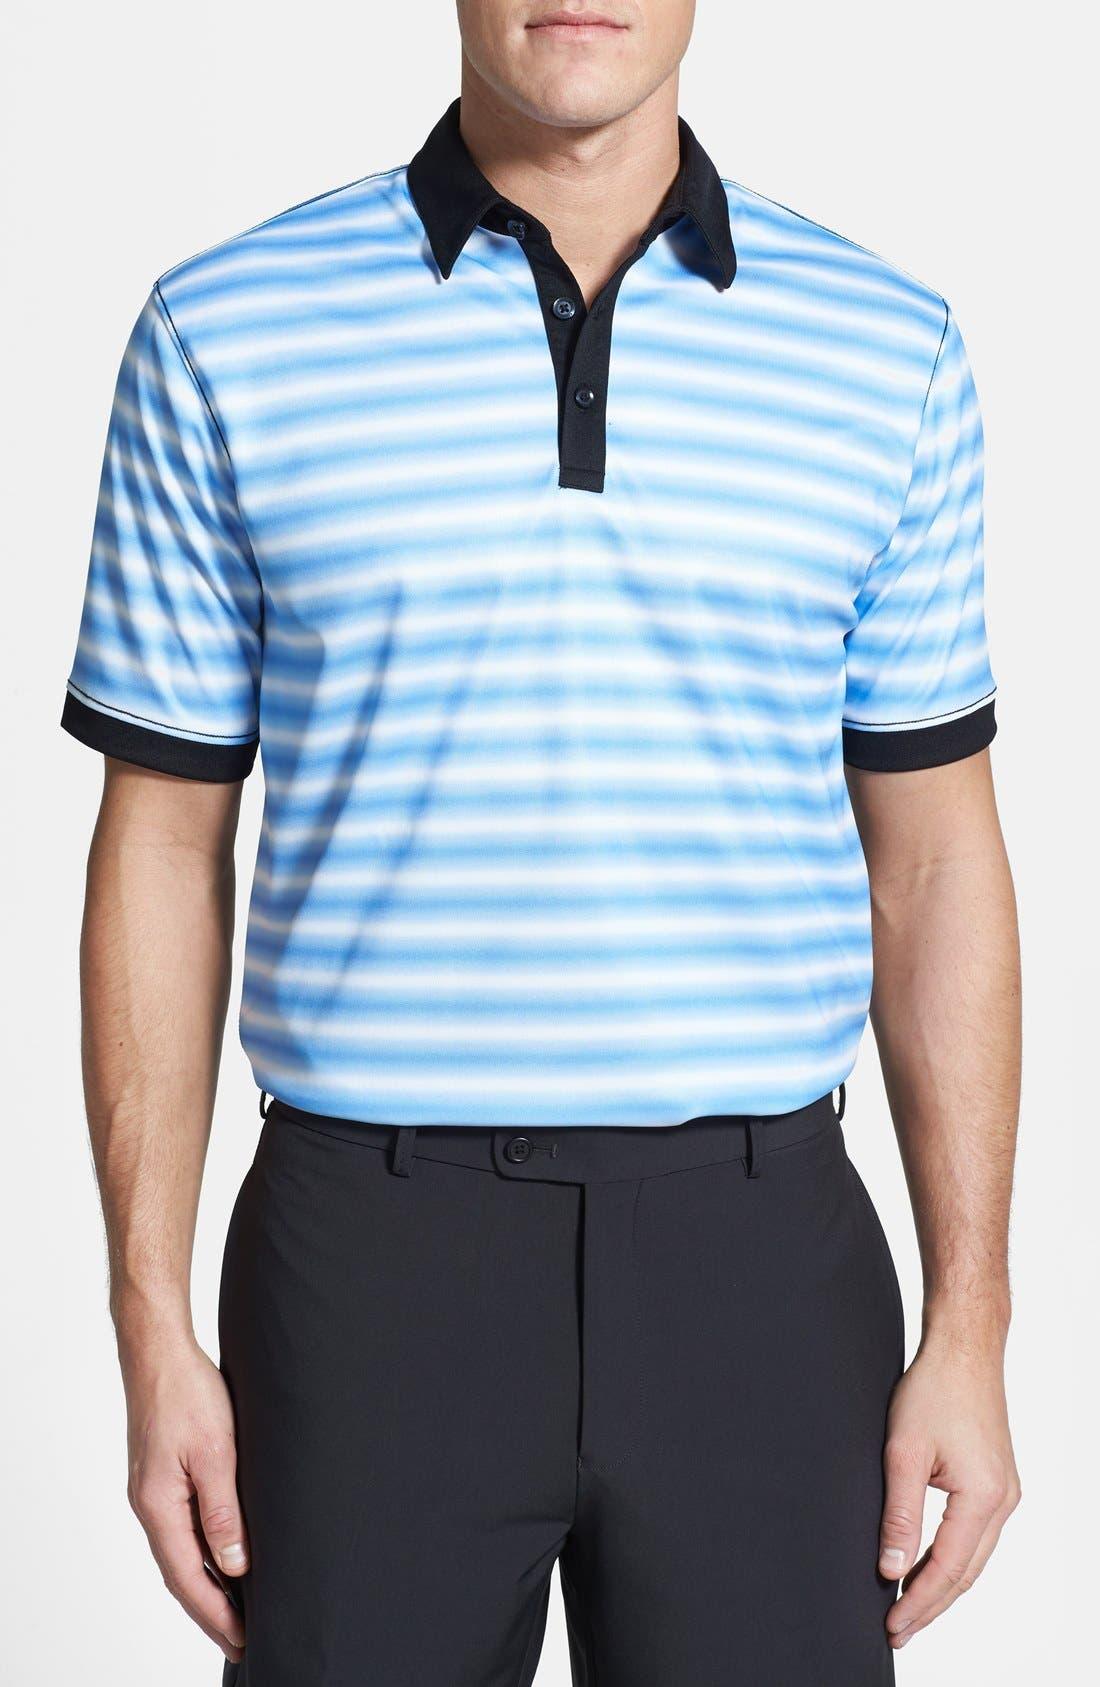 Main Image - Callaway Golf® 'Bolt' Opti-Dri Moisture Wicking Polo